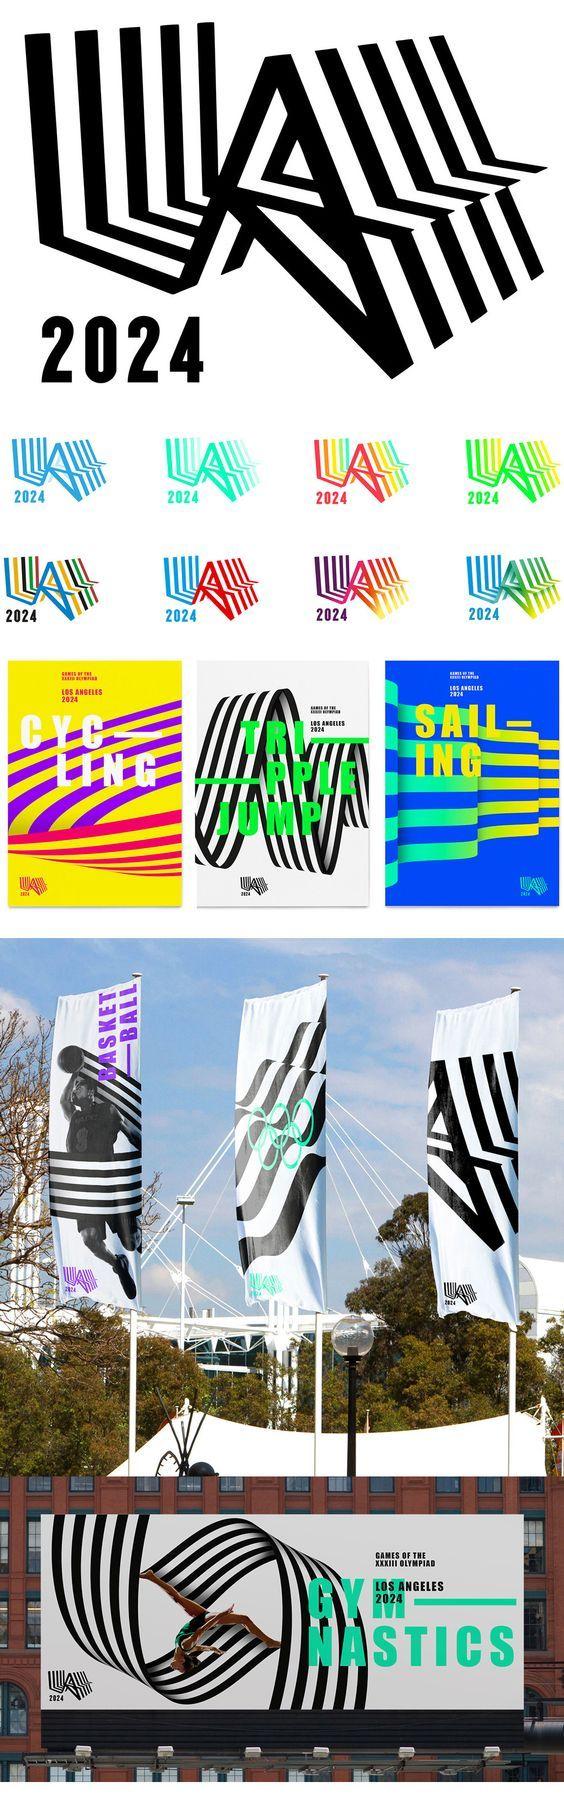 LA 2024 Olympics Bid #graphic #design #identity